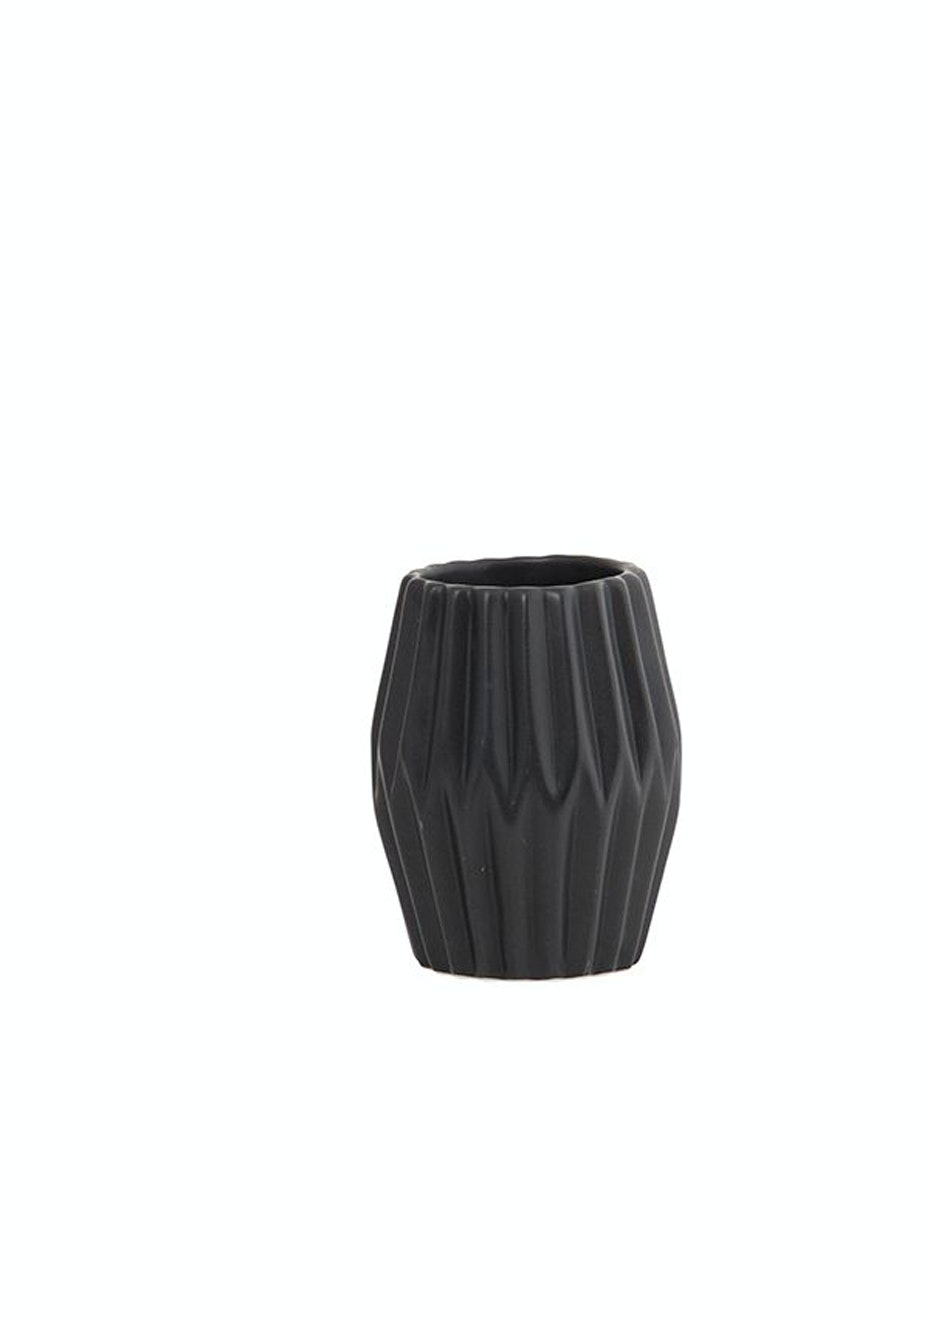 General Eclectic - Votive Porcelain Tall Black